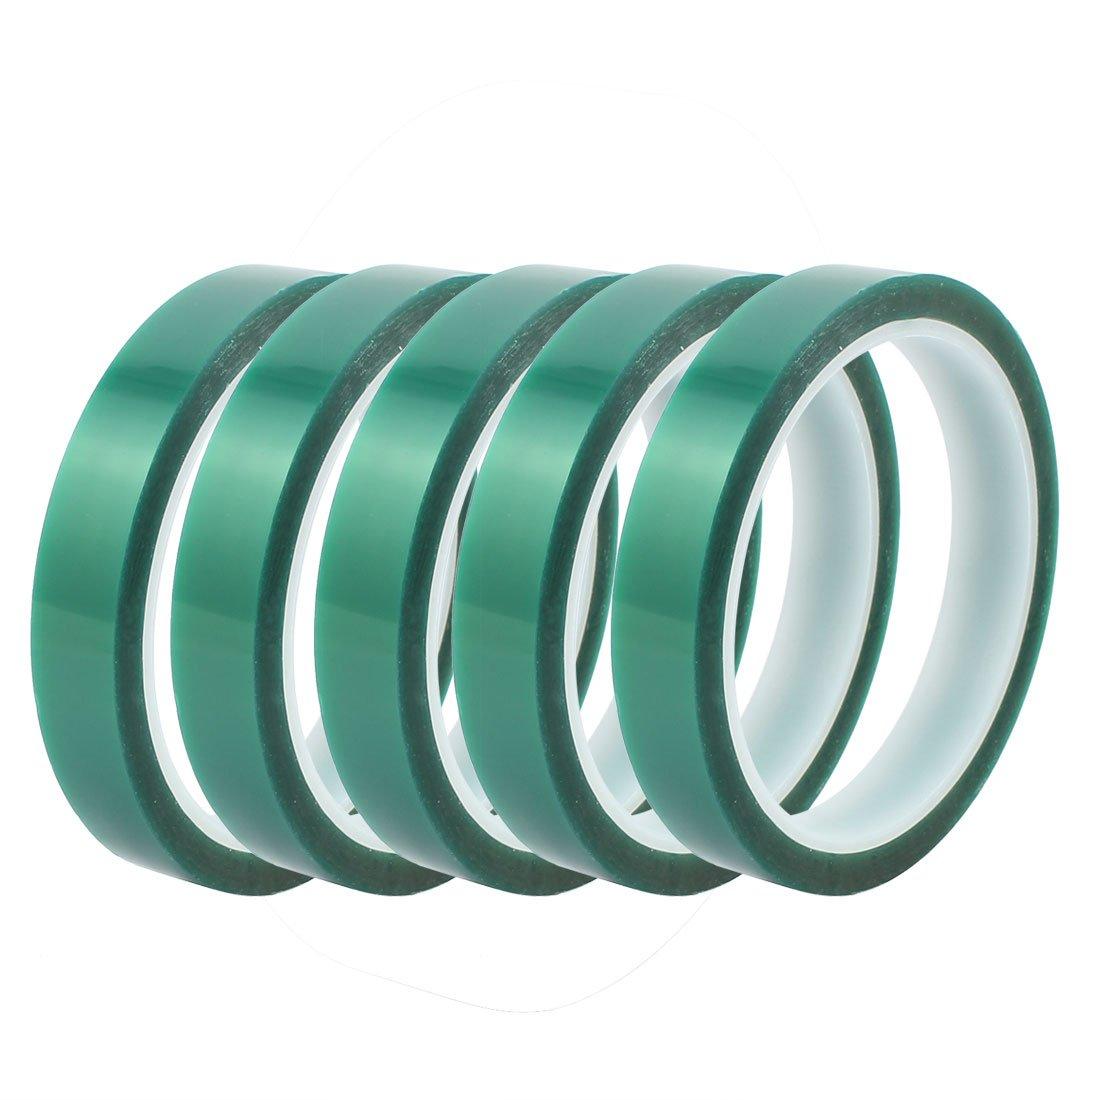 Aexit 5 Pcs 15mm Width 33M Length Green PET Self Adhesive Tape High Temp Heat Resistant